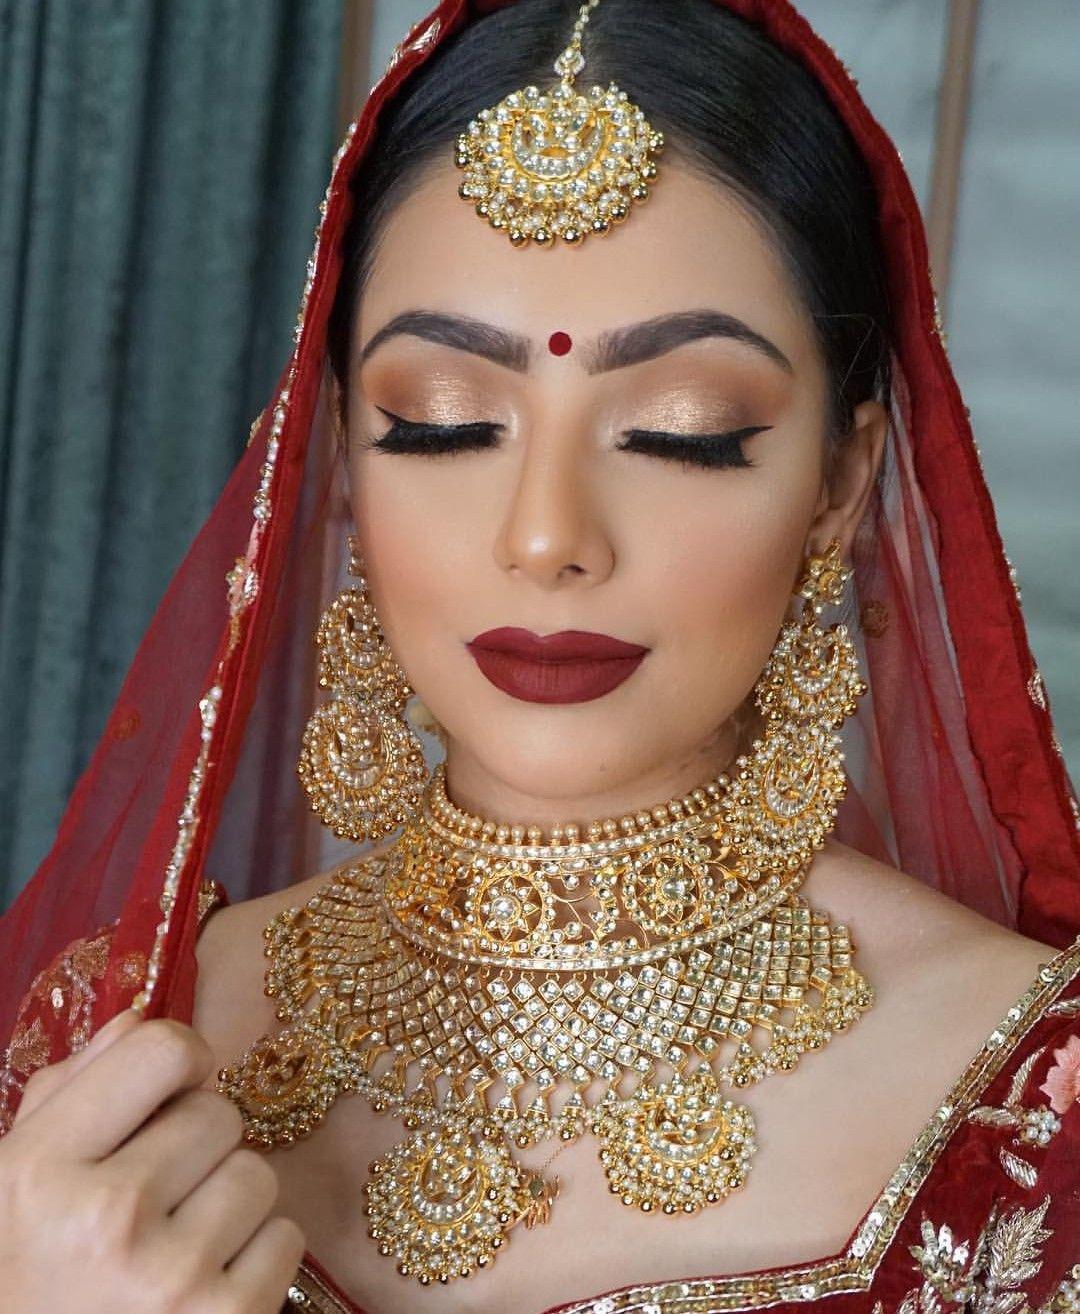 Indian Wedding Makeup: Indian Bridal Makeup And Jewellery. Red Bridal Lehenga And